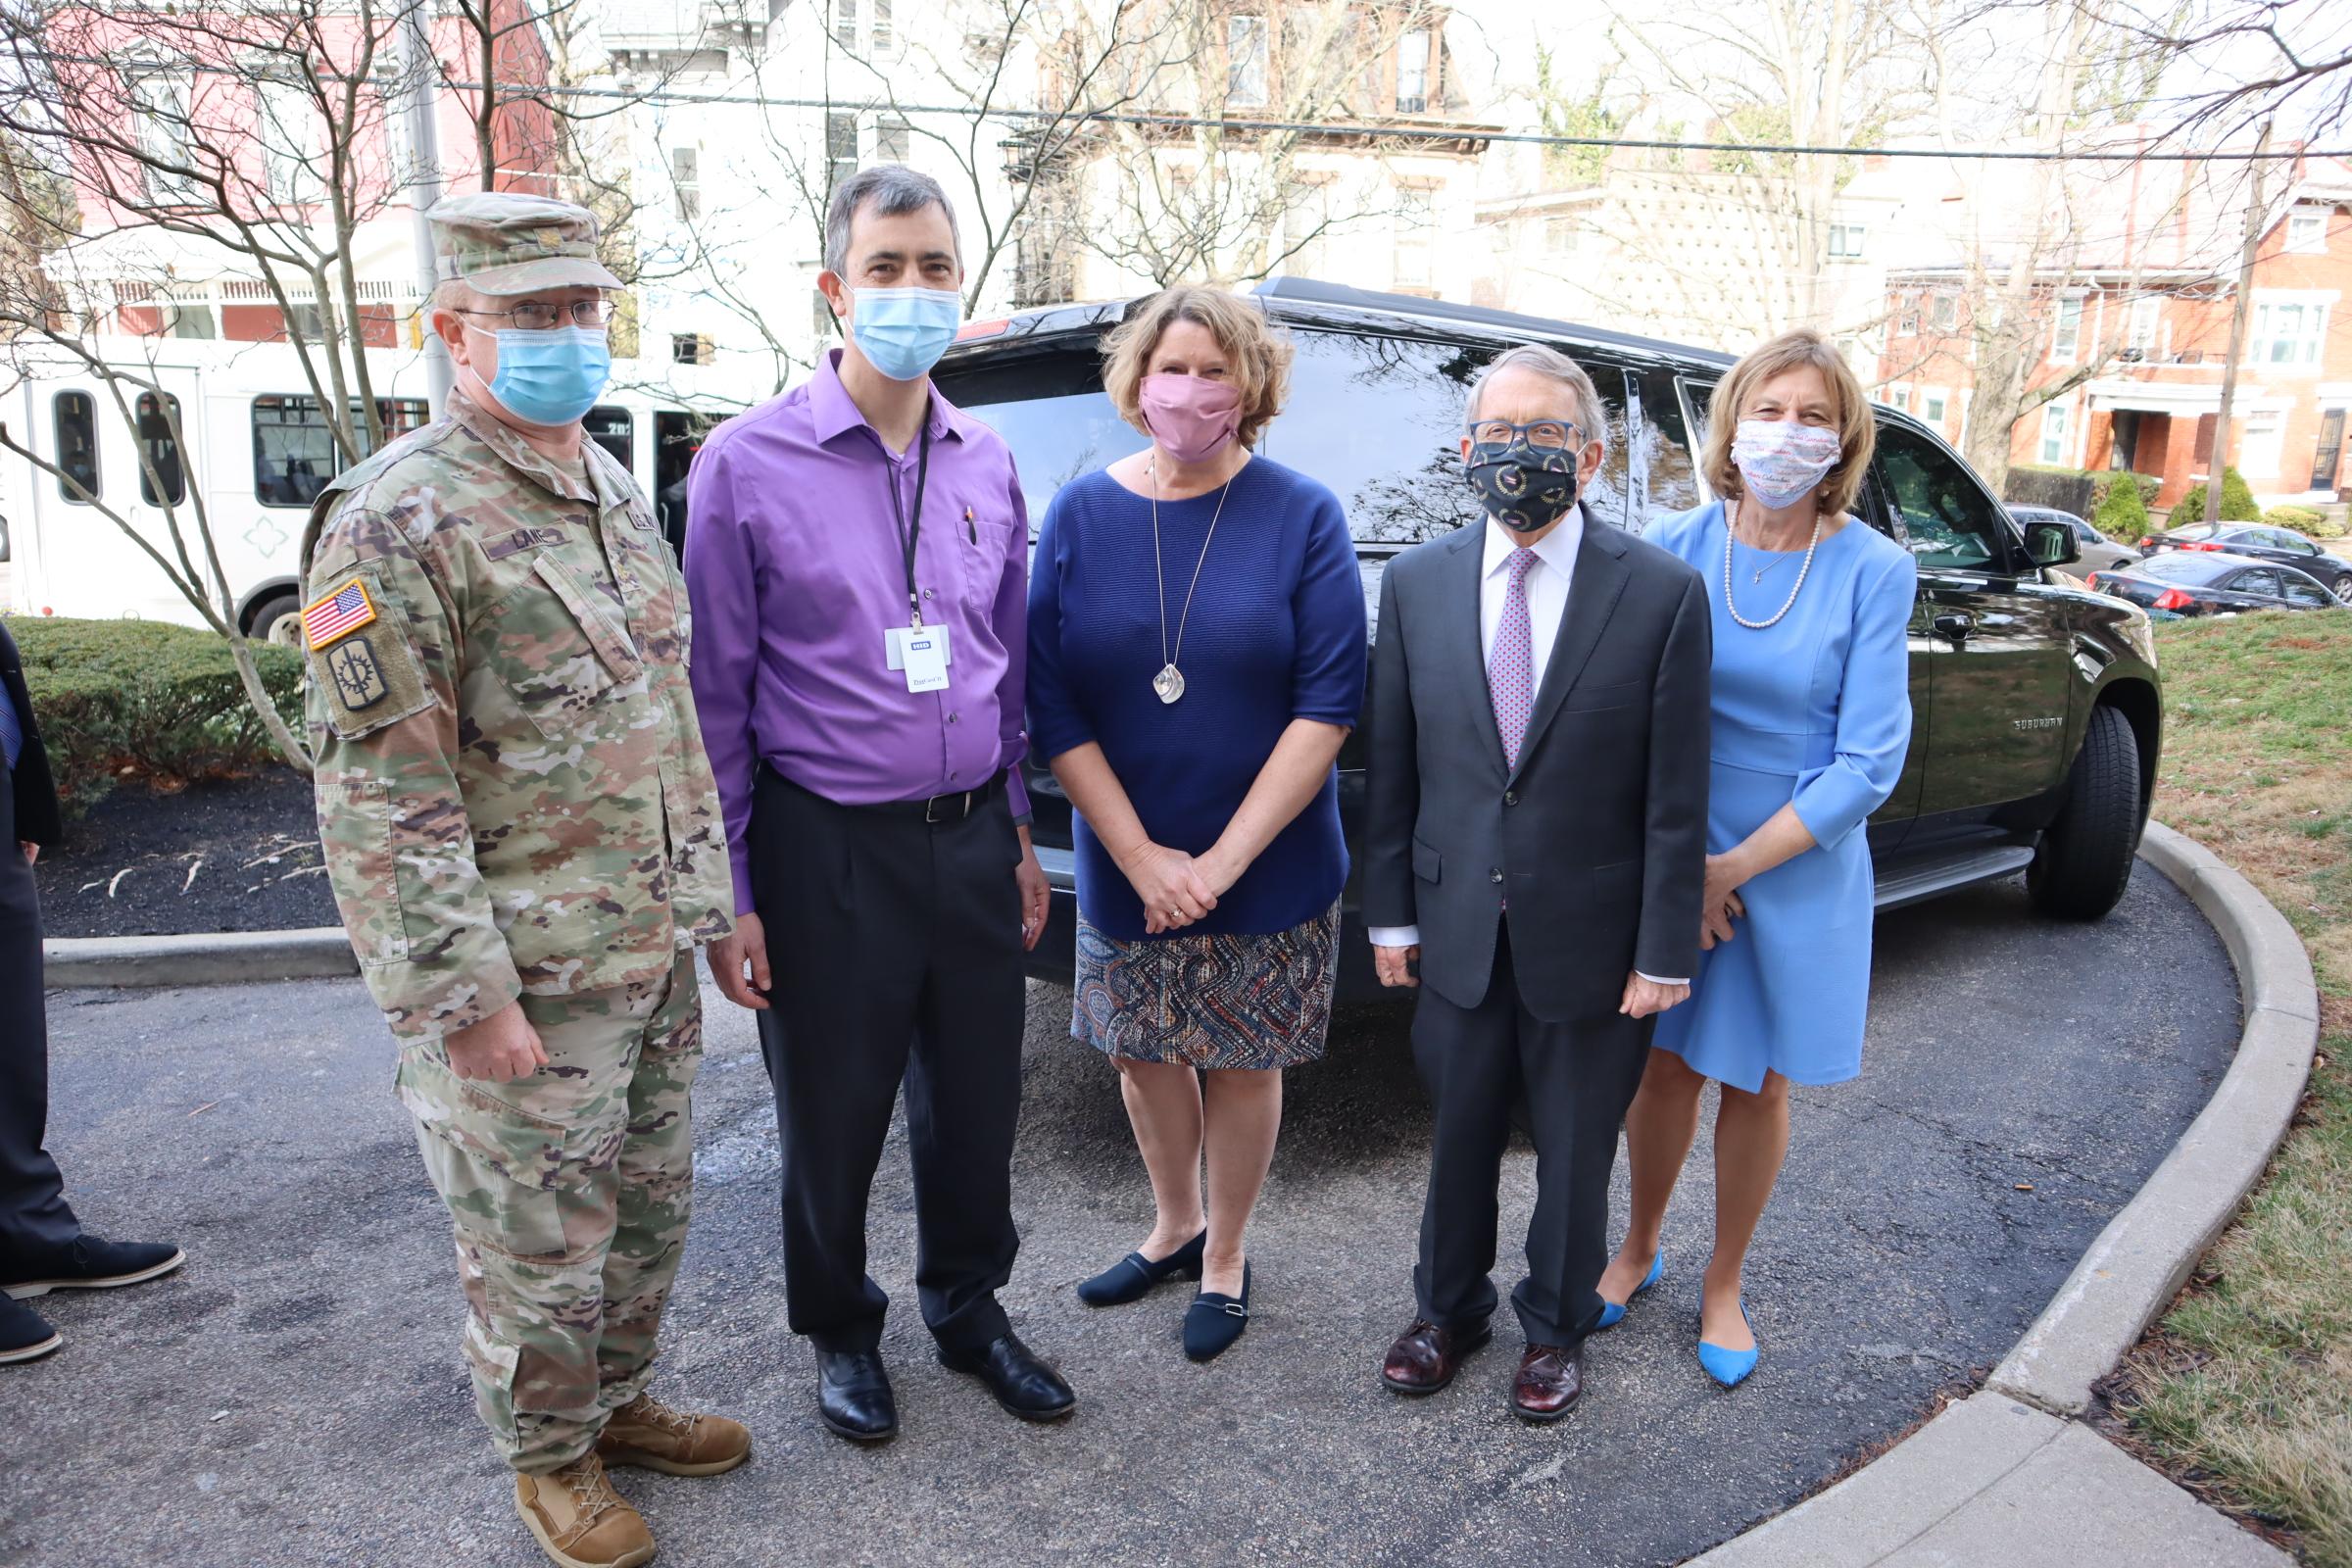 [PHOTOS] Ohio Gov DeWine Visits Cincinnati-Area Vaccination Clinic for Older Adults